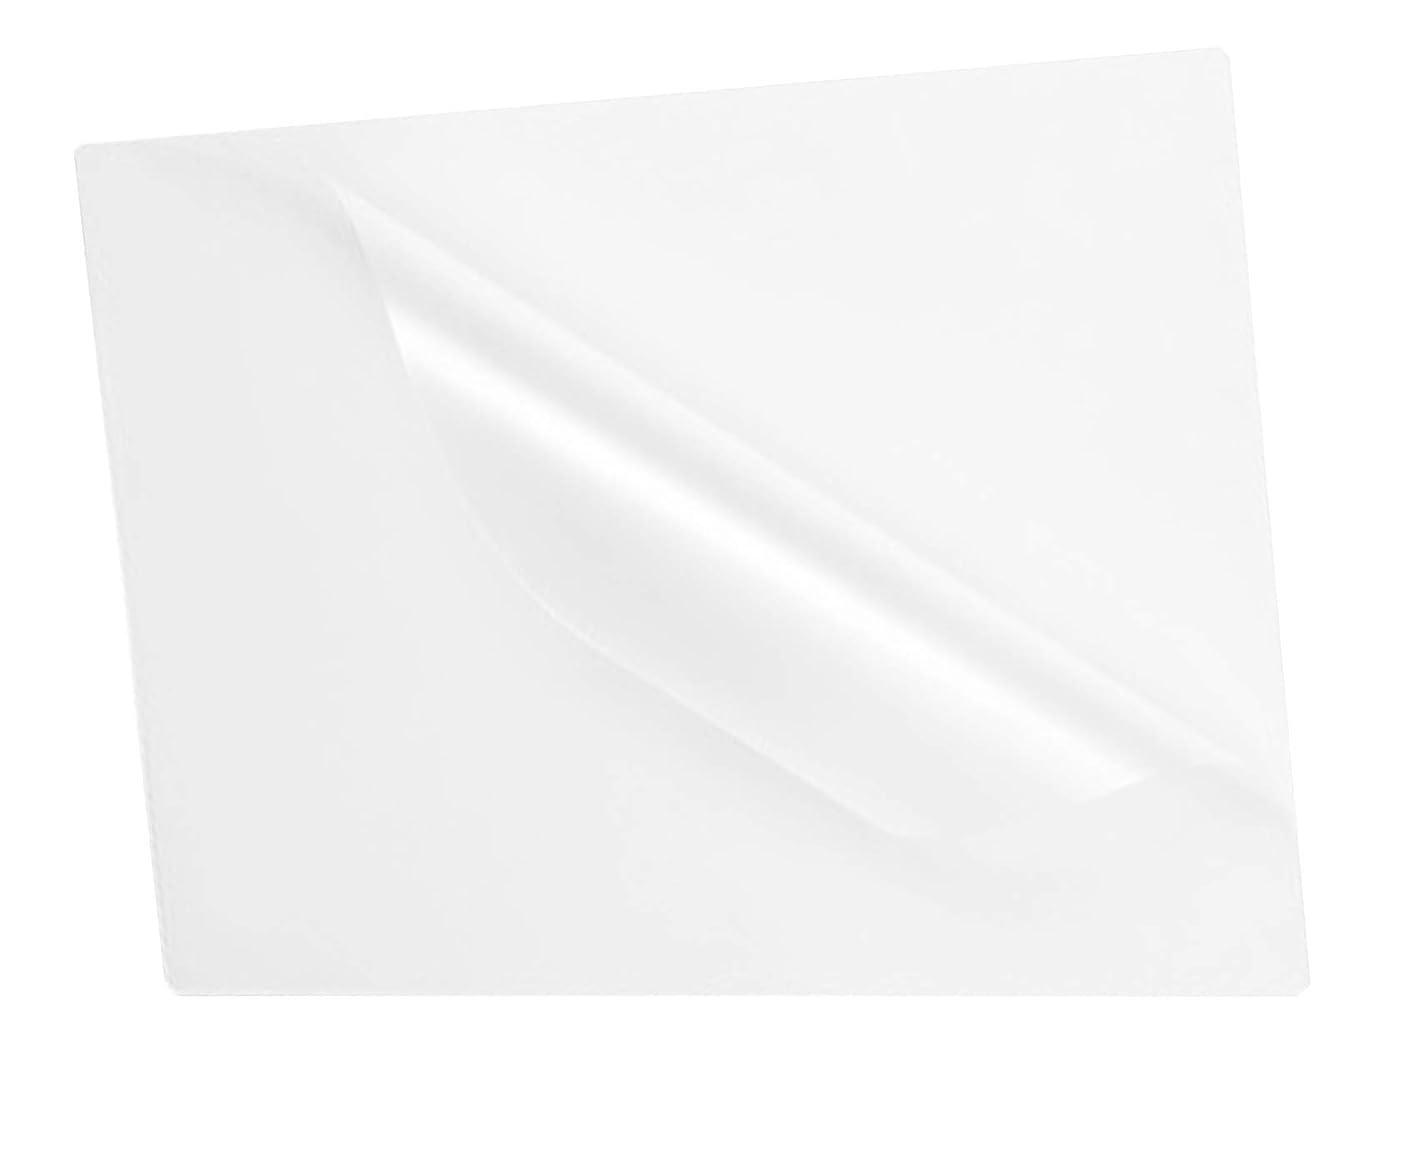 Qty 500 7 Mil Military Card Laminating Pouches 2-5/8 x 3-7/8 Hot Laminator Sleeves azcxajeeian707